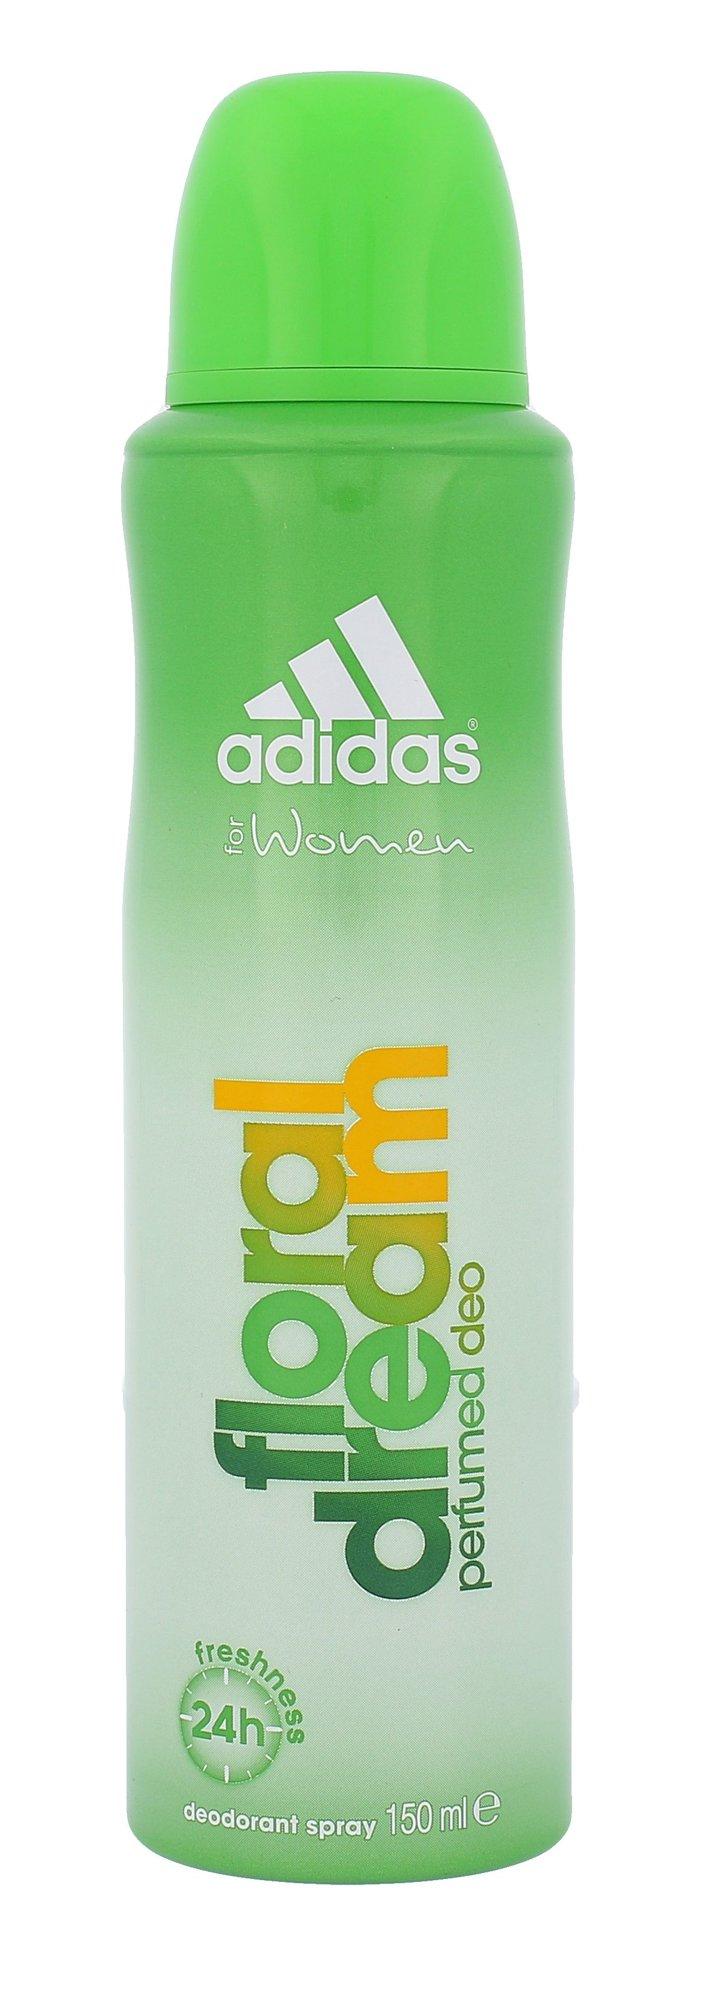 Adidas Floral Dream For Women Deodorant 150ml